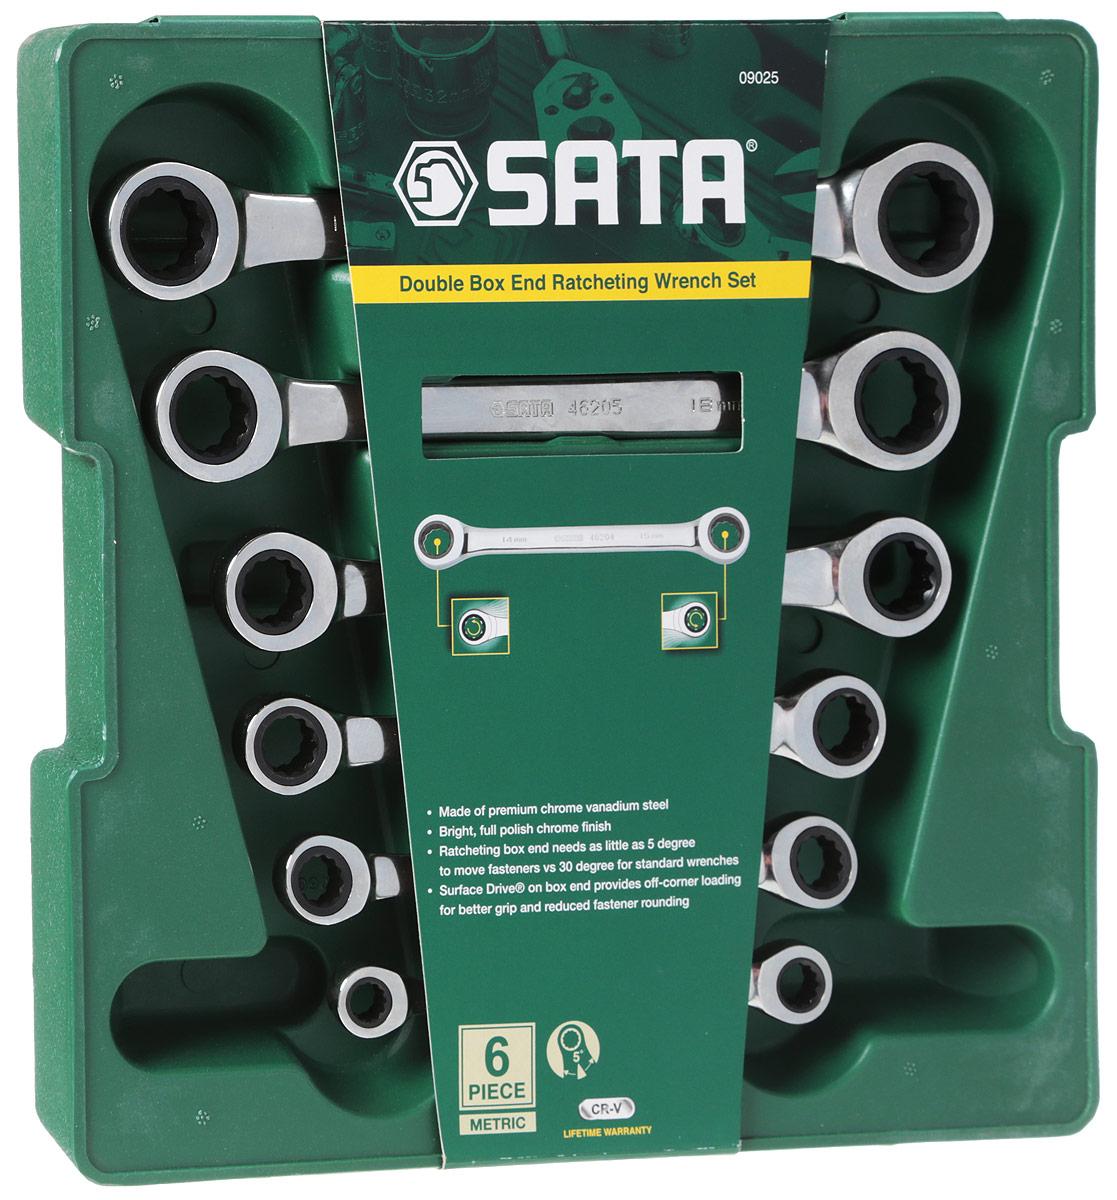 Набор ключей SATA 6пр. 09025 набор ключей sata 09033 7пр комбинированные укороч metric пласт кор